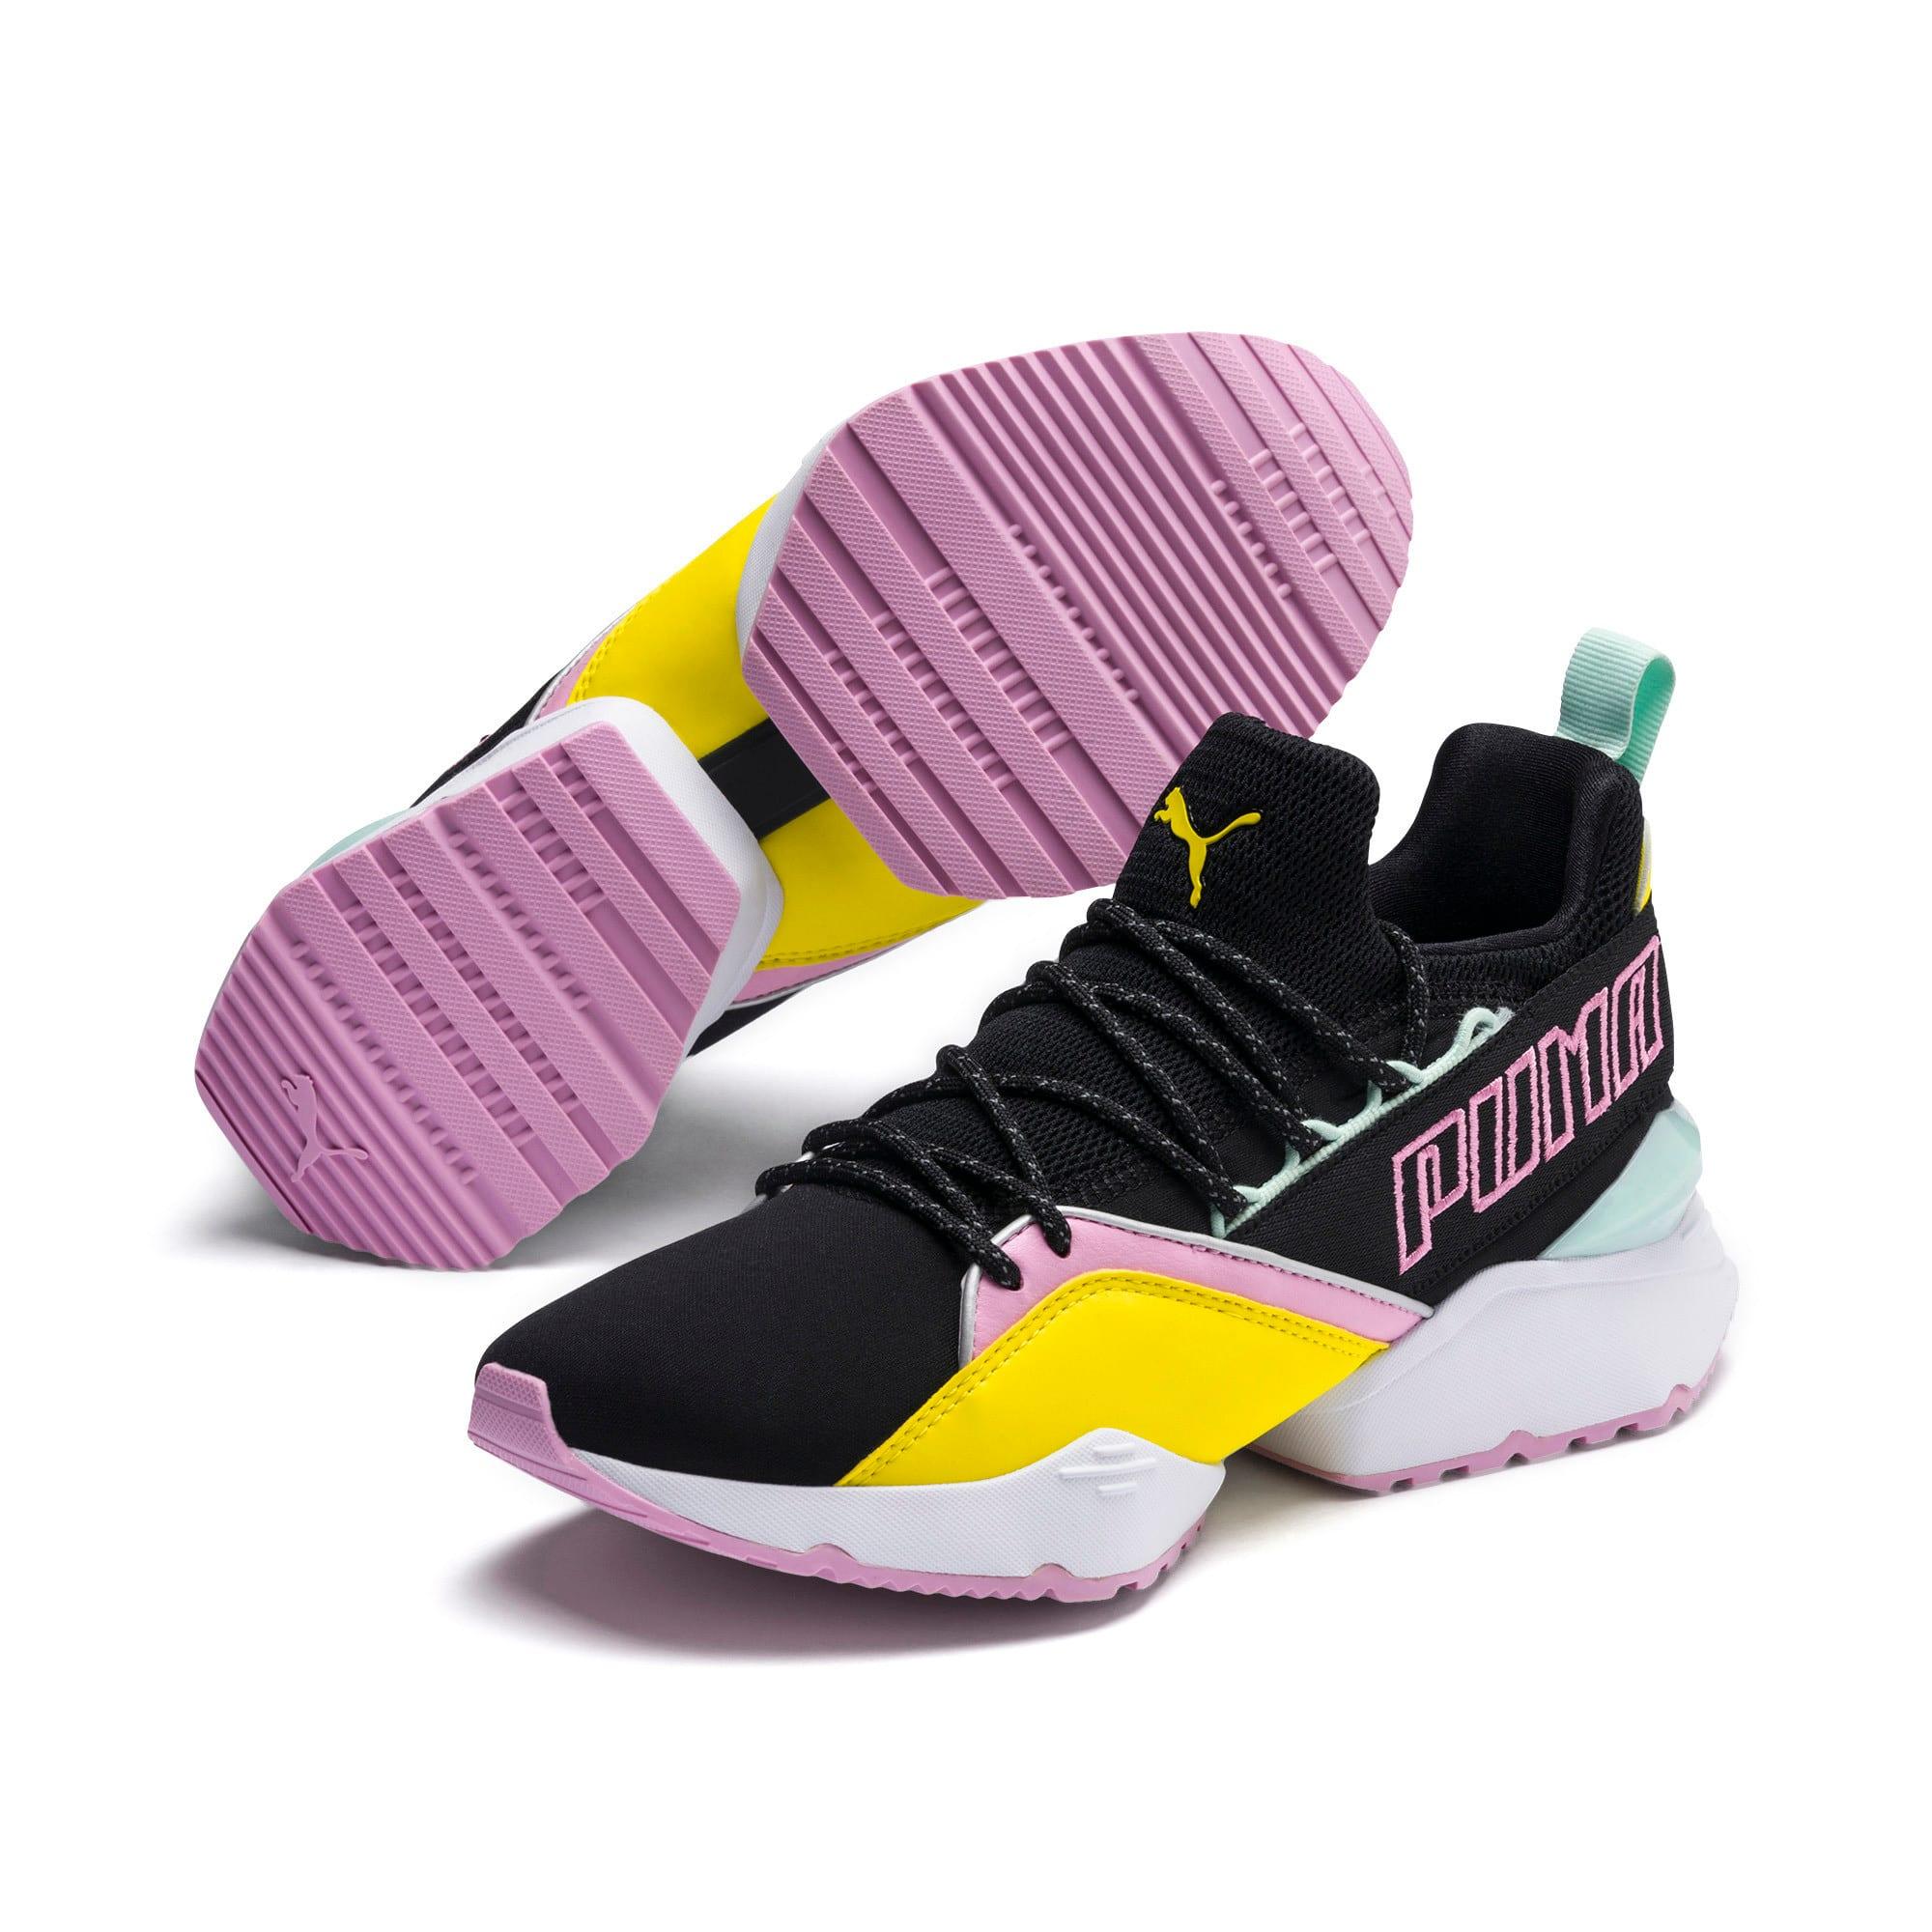 Thumbnail 3 of Muse Maia TZ Damen Sneaker, Puma Black-Blazing Yellow, medium